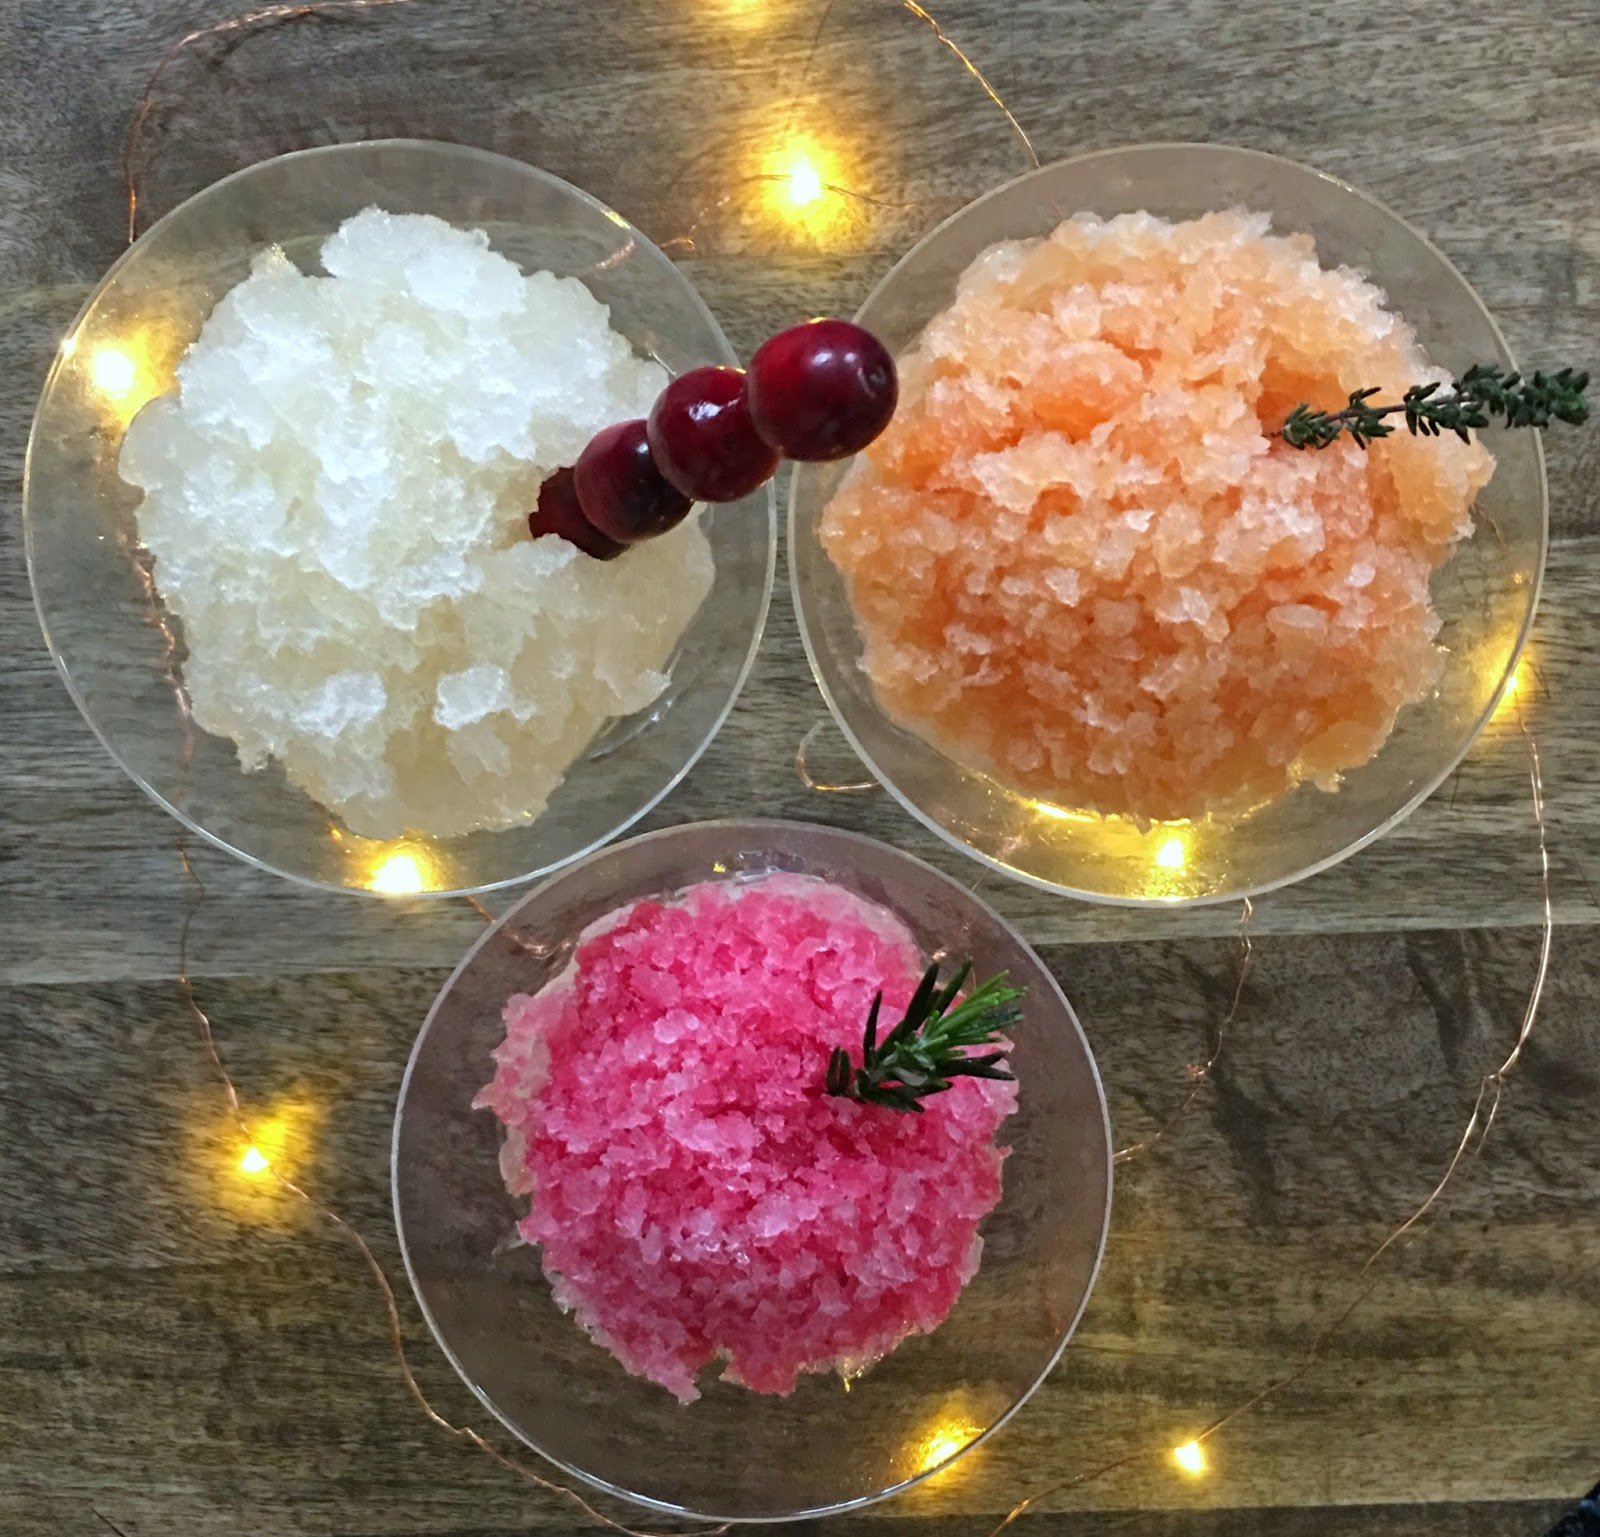 Seasons Granitas! Festive Holiday Granita Recipes, perfect Christmas ...